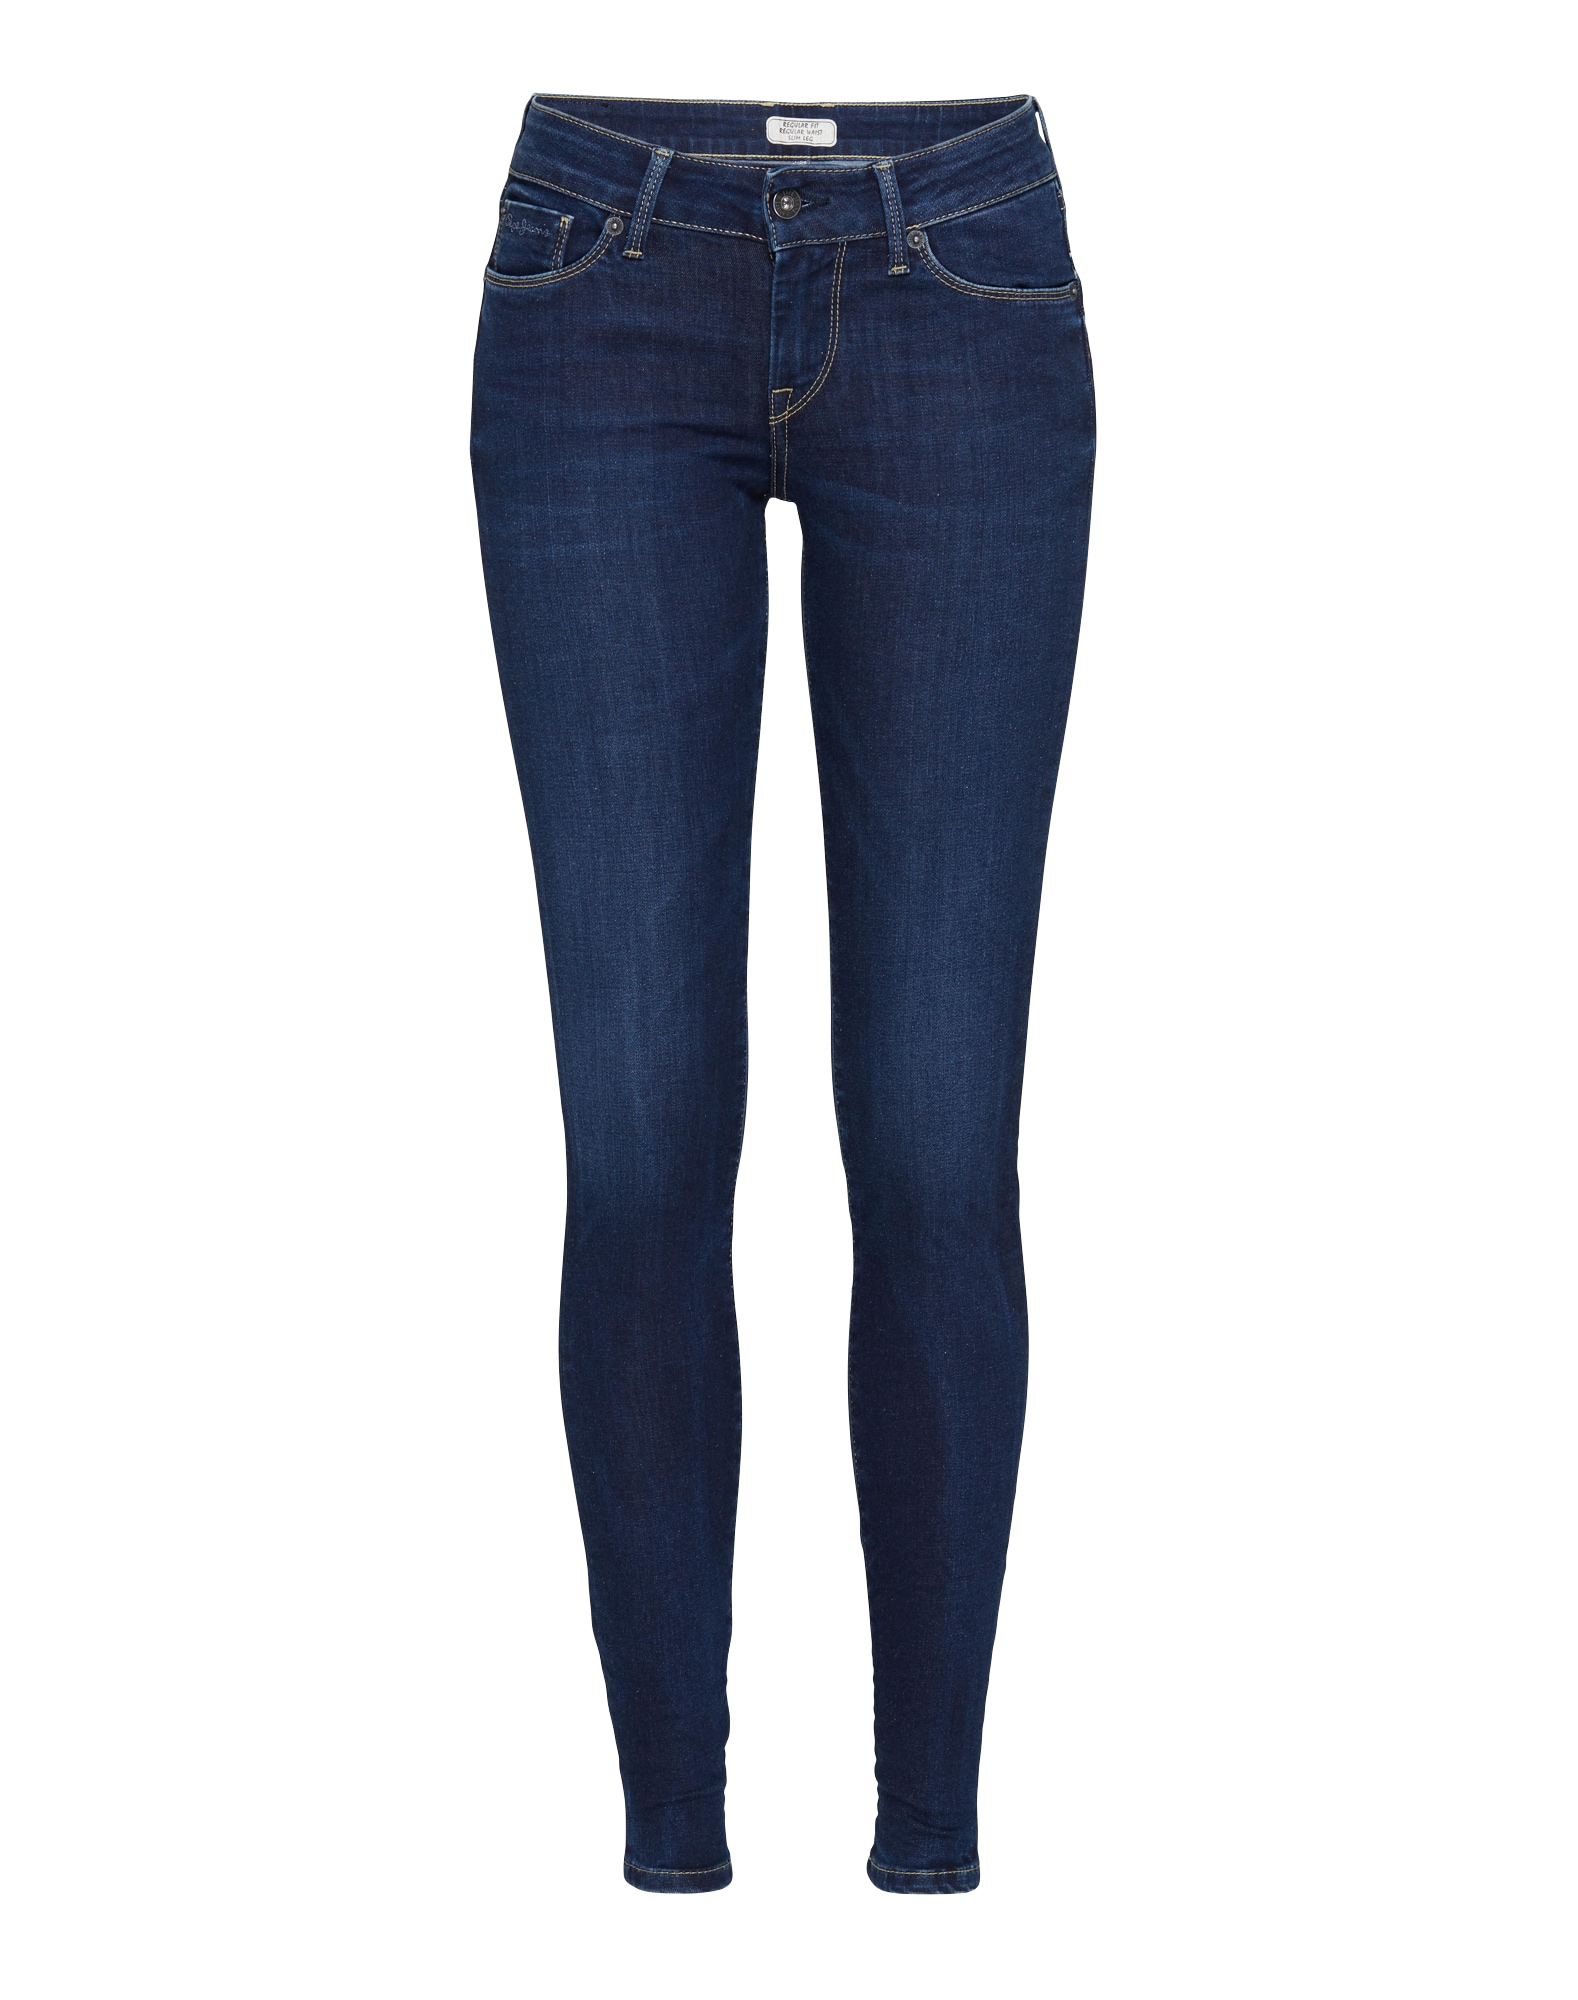 Pepe Jeans Dames Jeans Soho blue denim